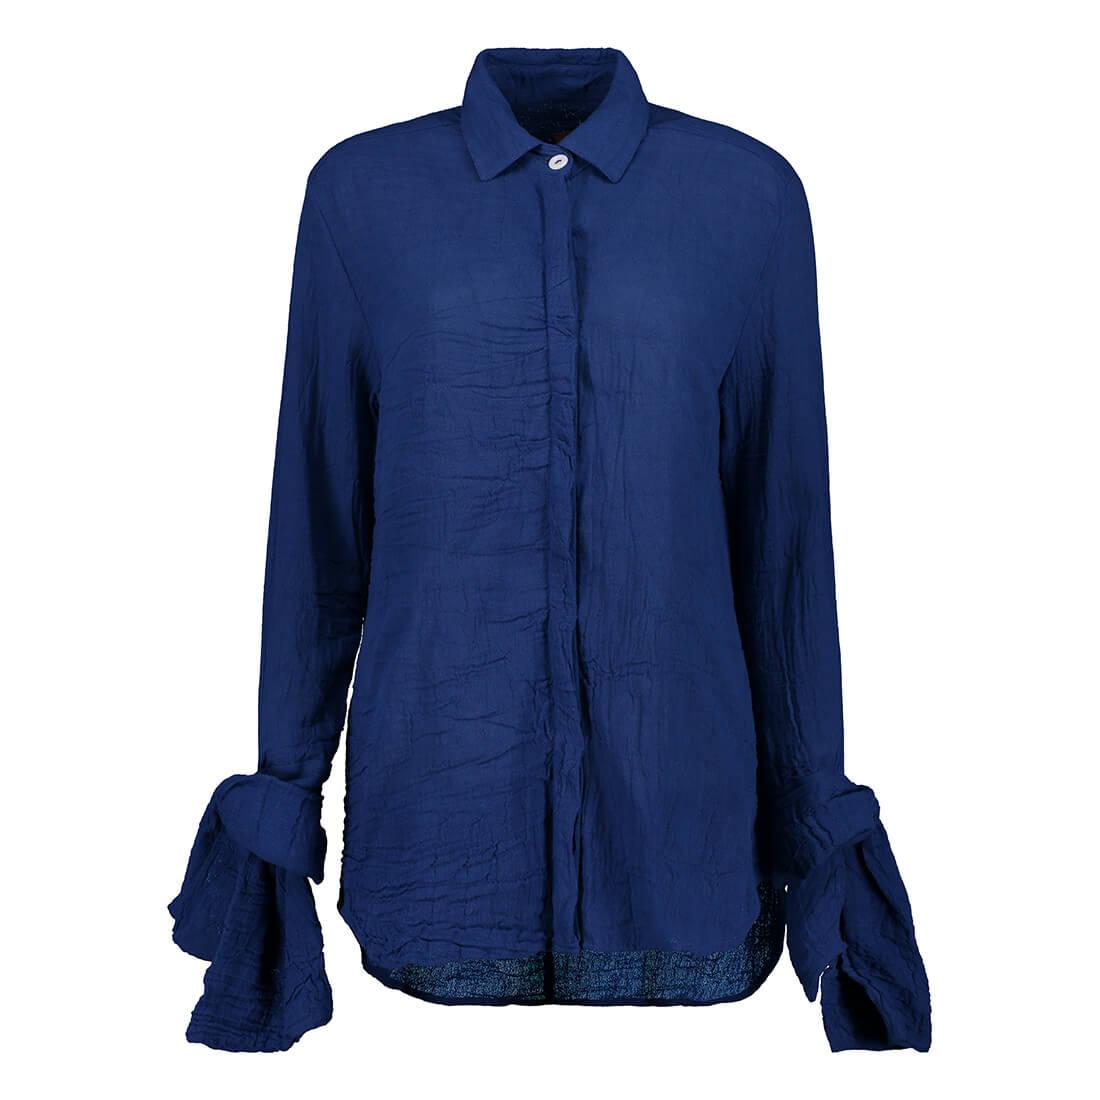 Sweetheart neckline blouse in 100% cotton 1